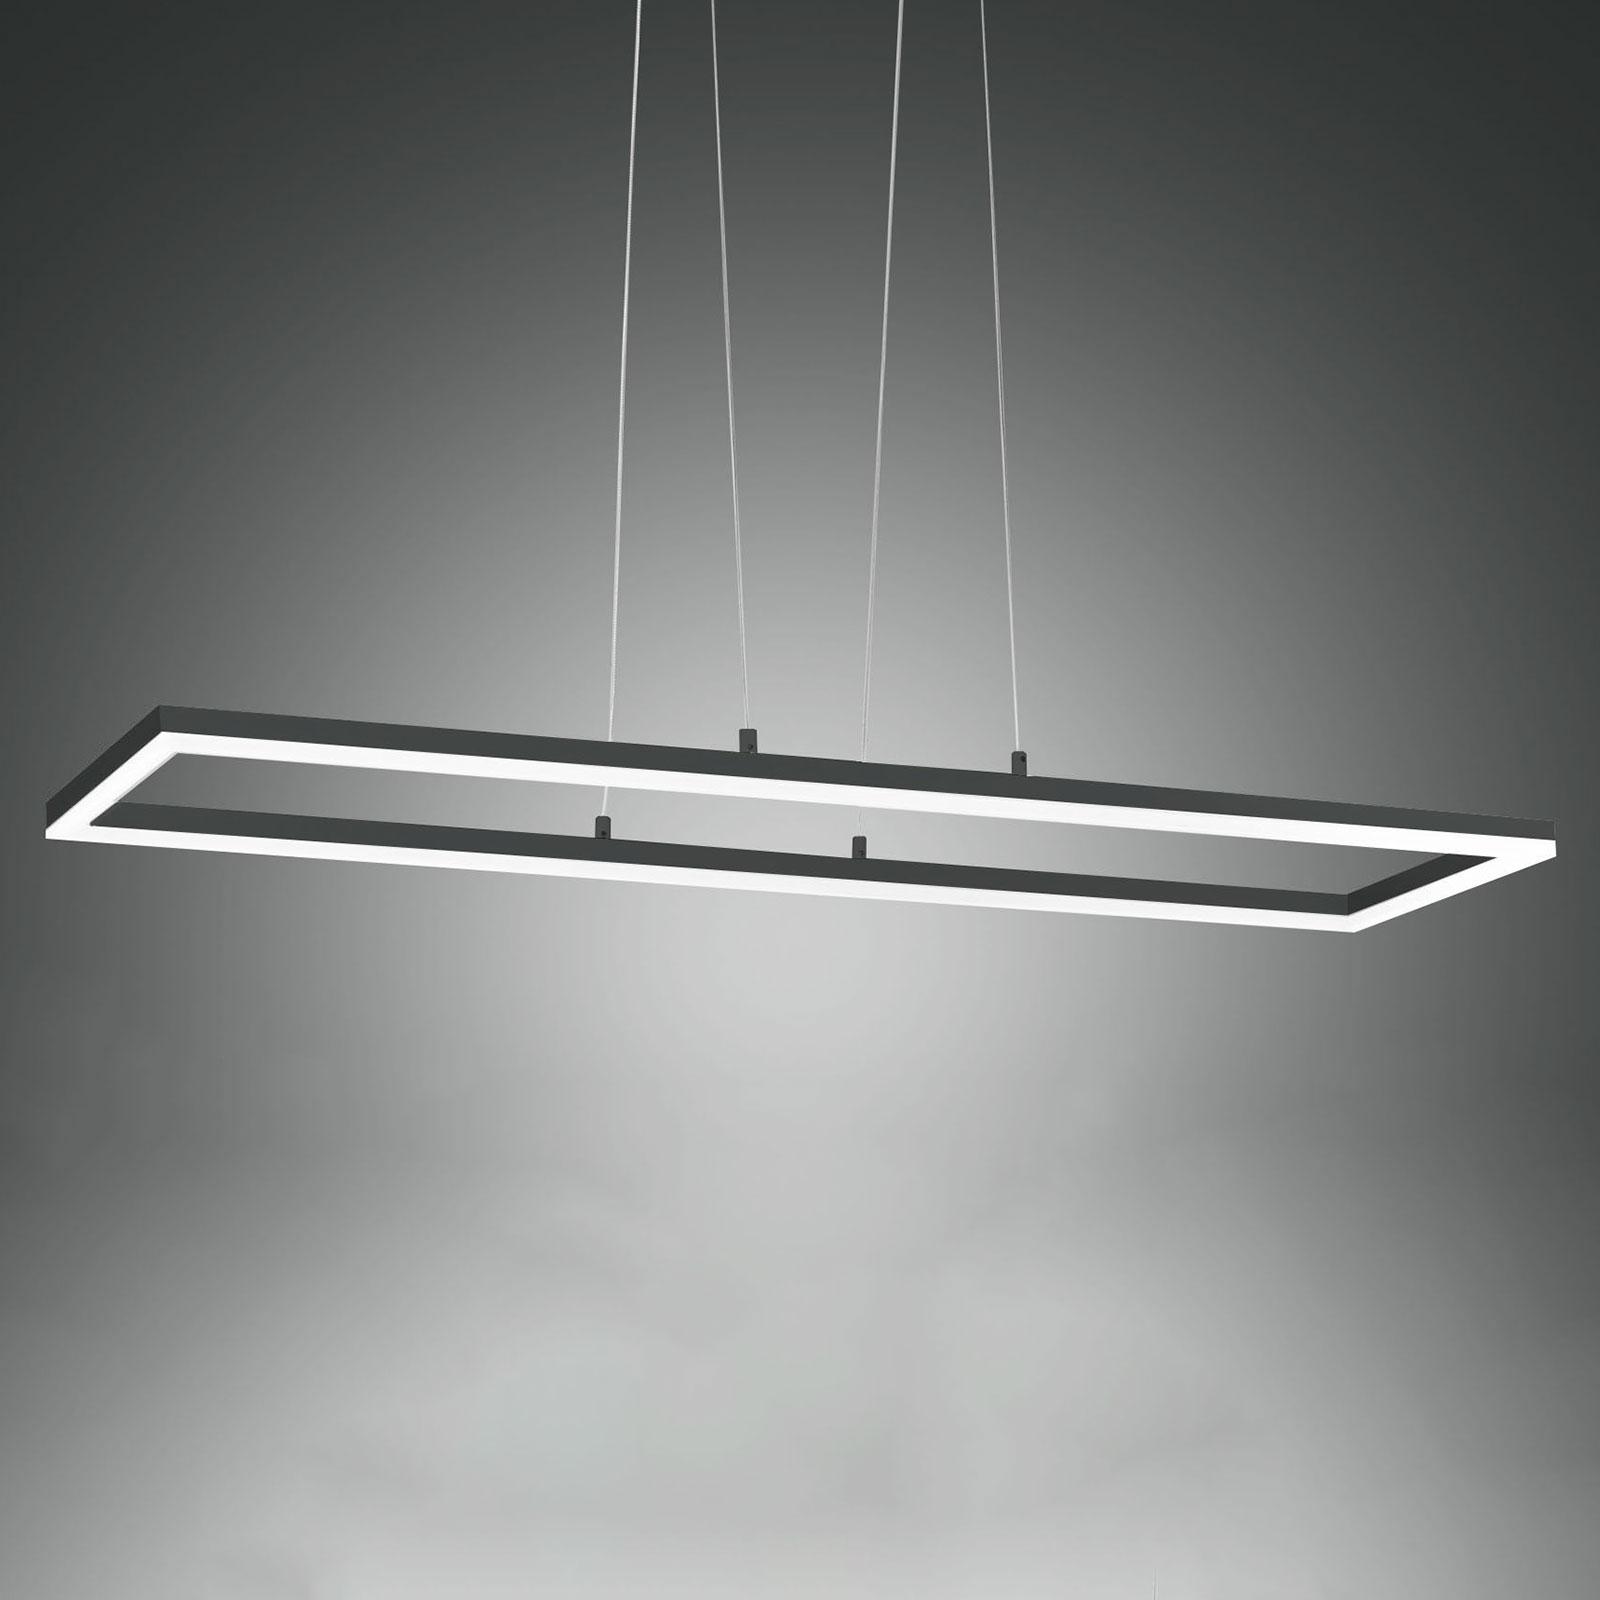 Lampa wisząca LED Bard, 92x32, antracytowa